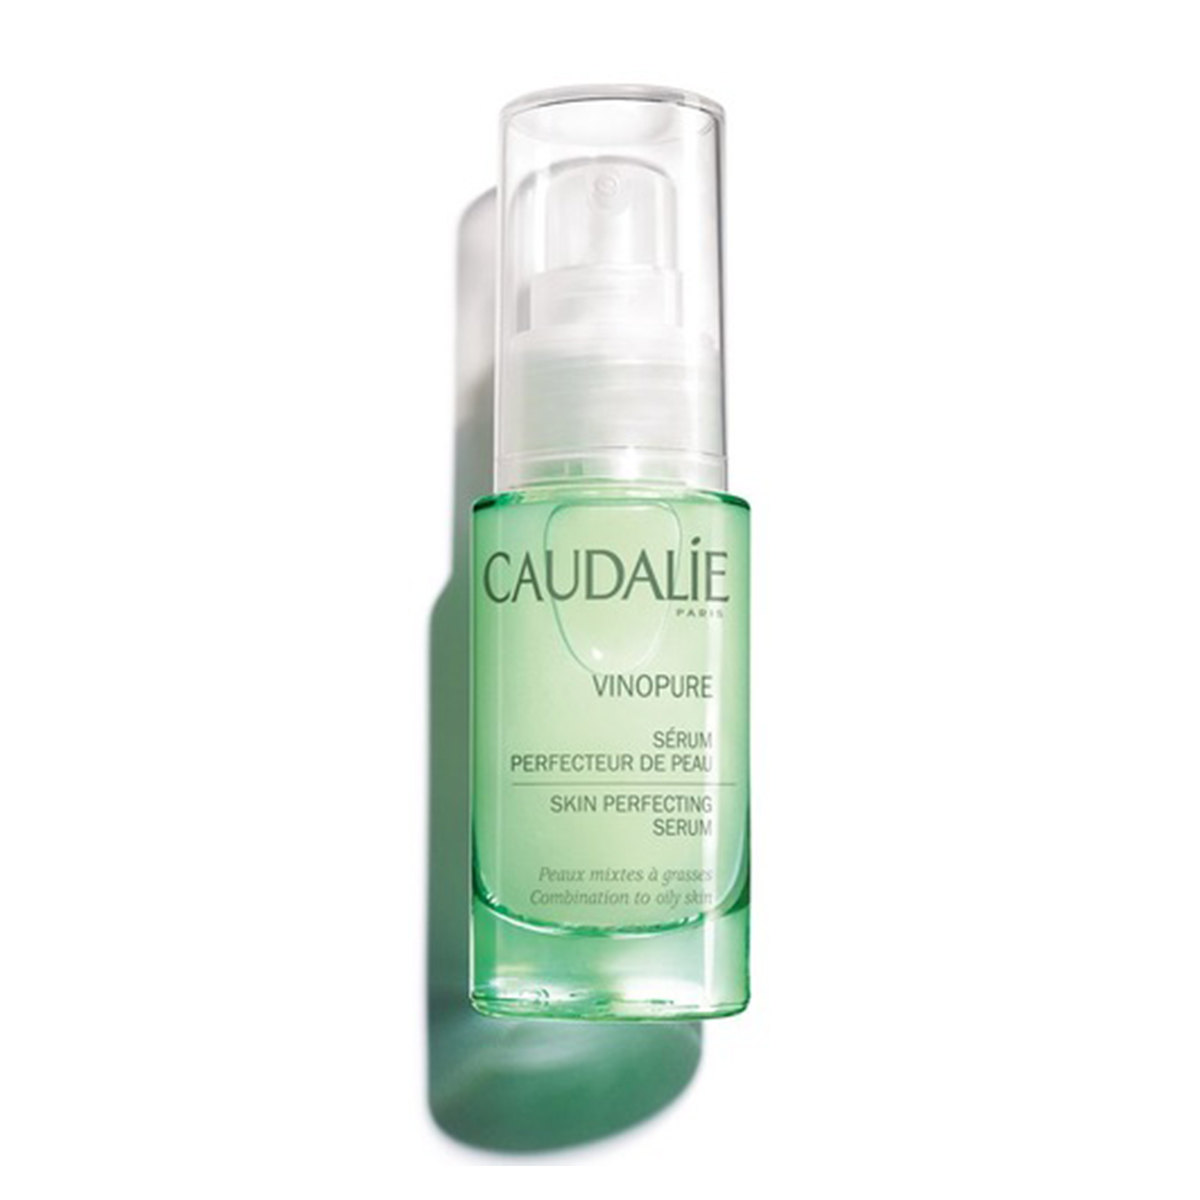 Сыворотка длясужения пор Vinopure Skin Perfecting Serum, Caudalie